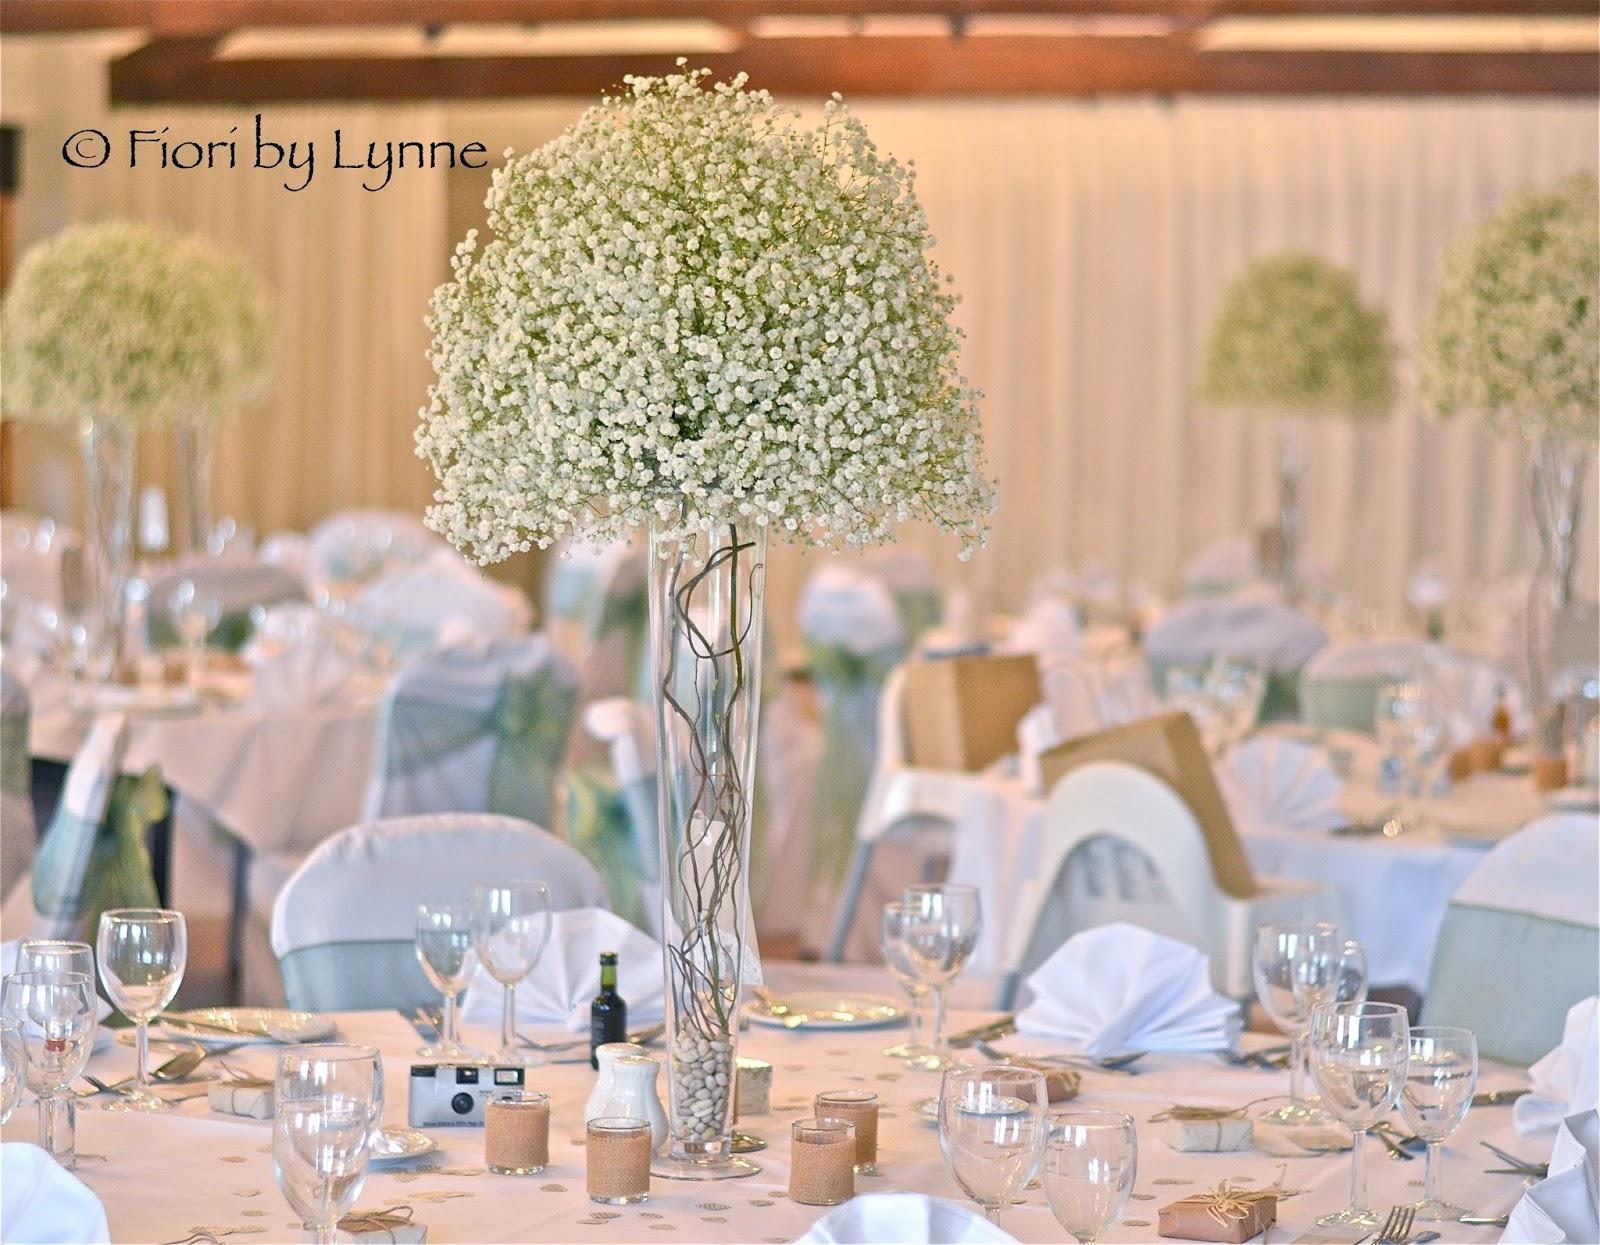 Wedding Flowers Blog Jenna 39 S Rustic Gypsophila East Horton Golf